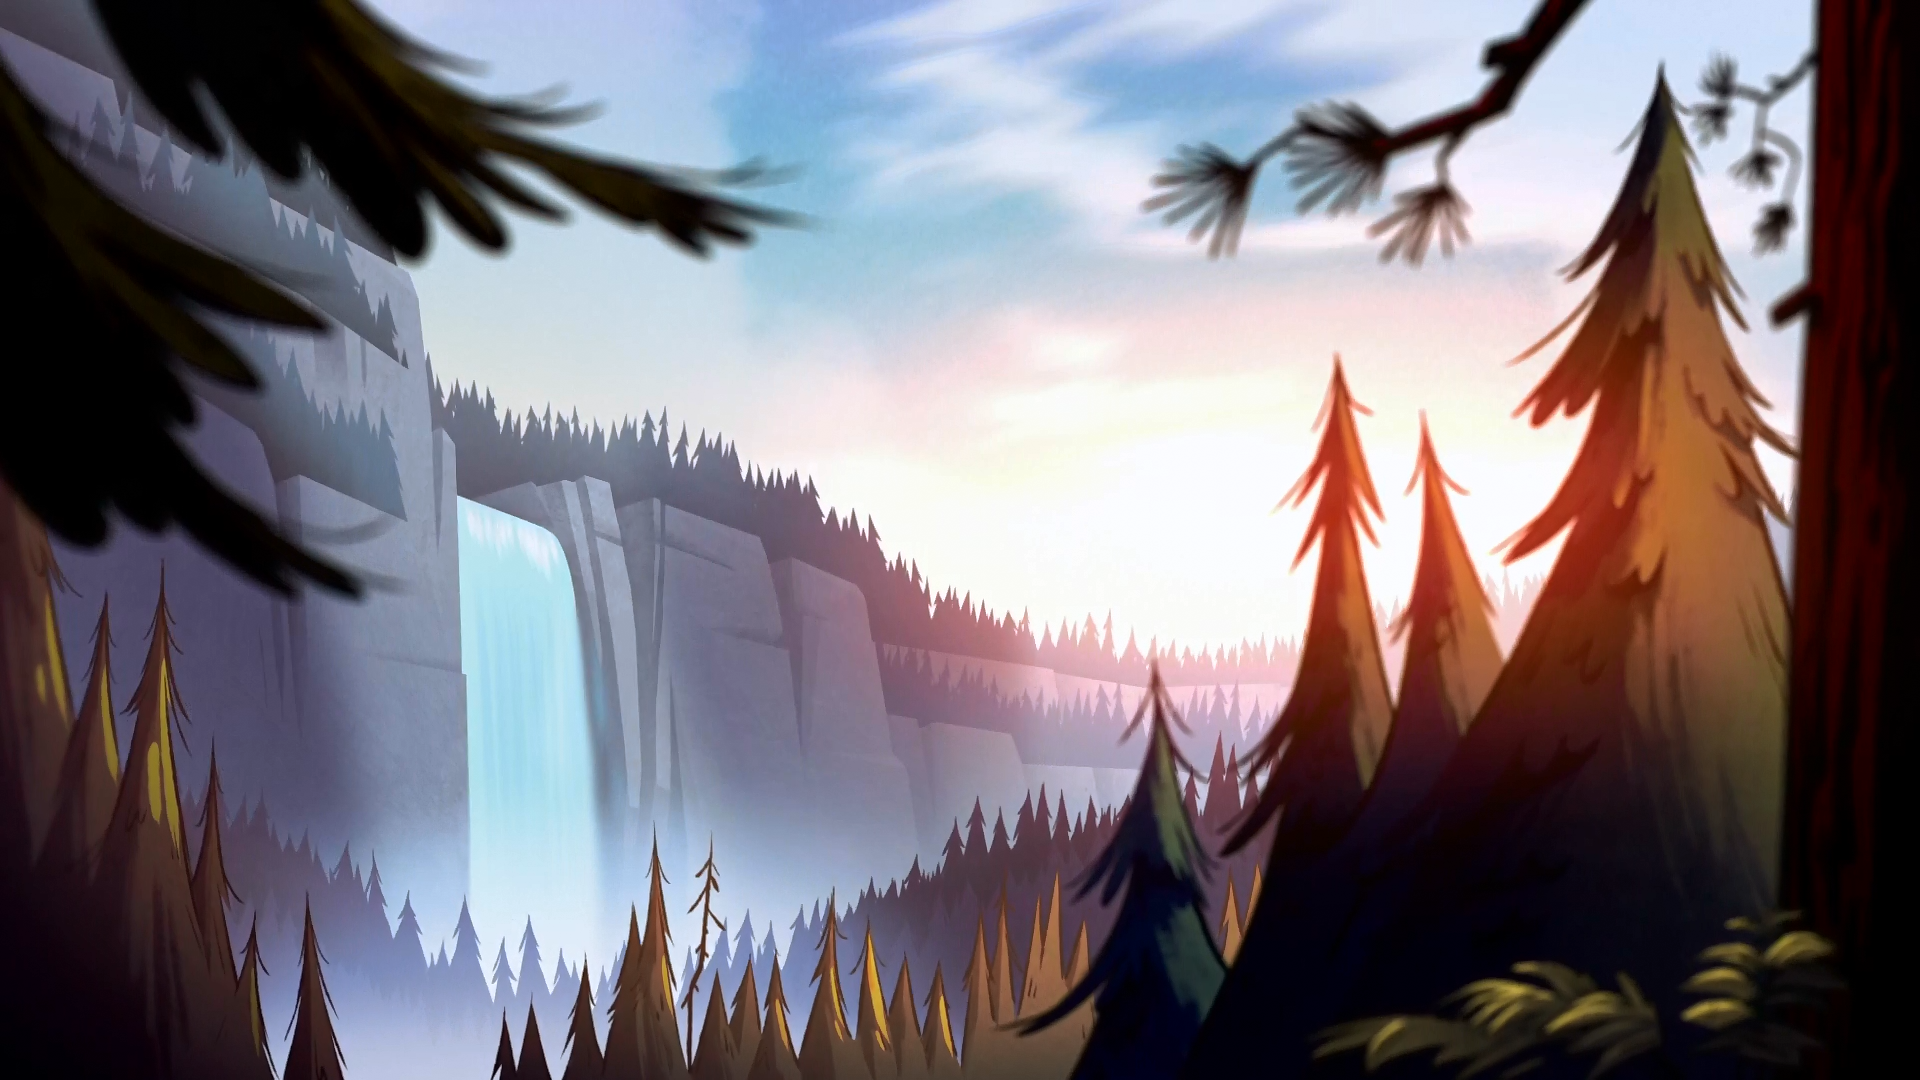 Gravity Falls Desktop Background Пейзажи, Гравити фолз